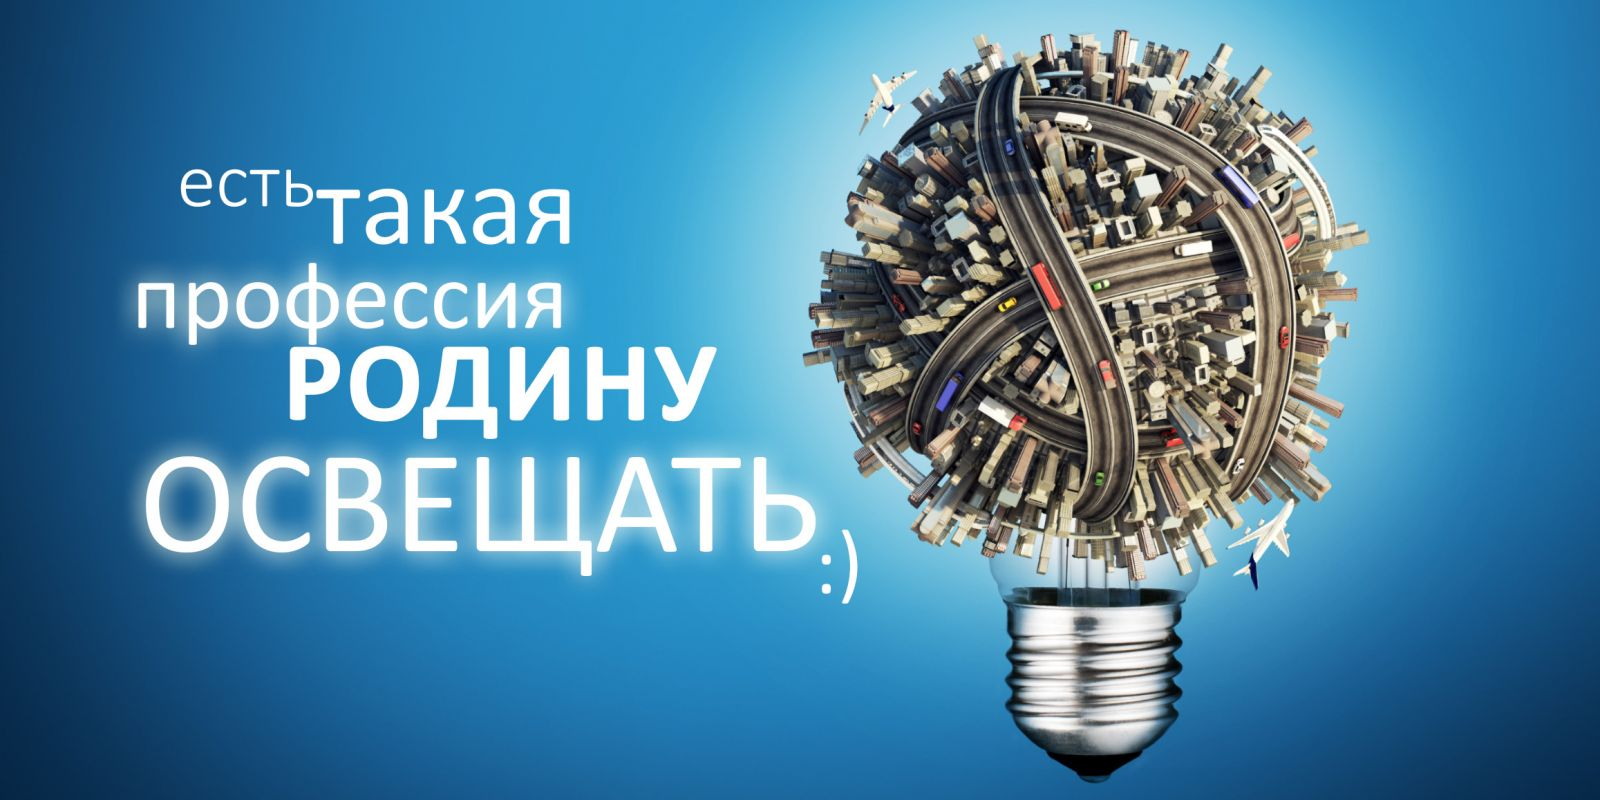 Открытки на день электрика